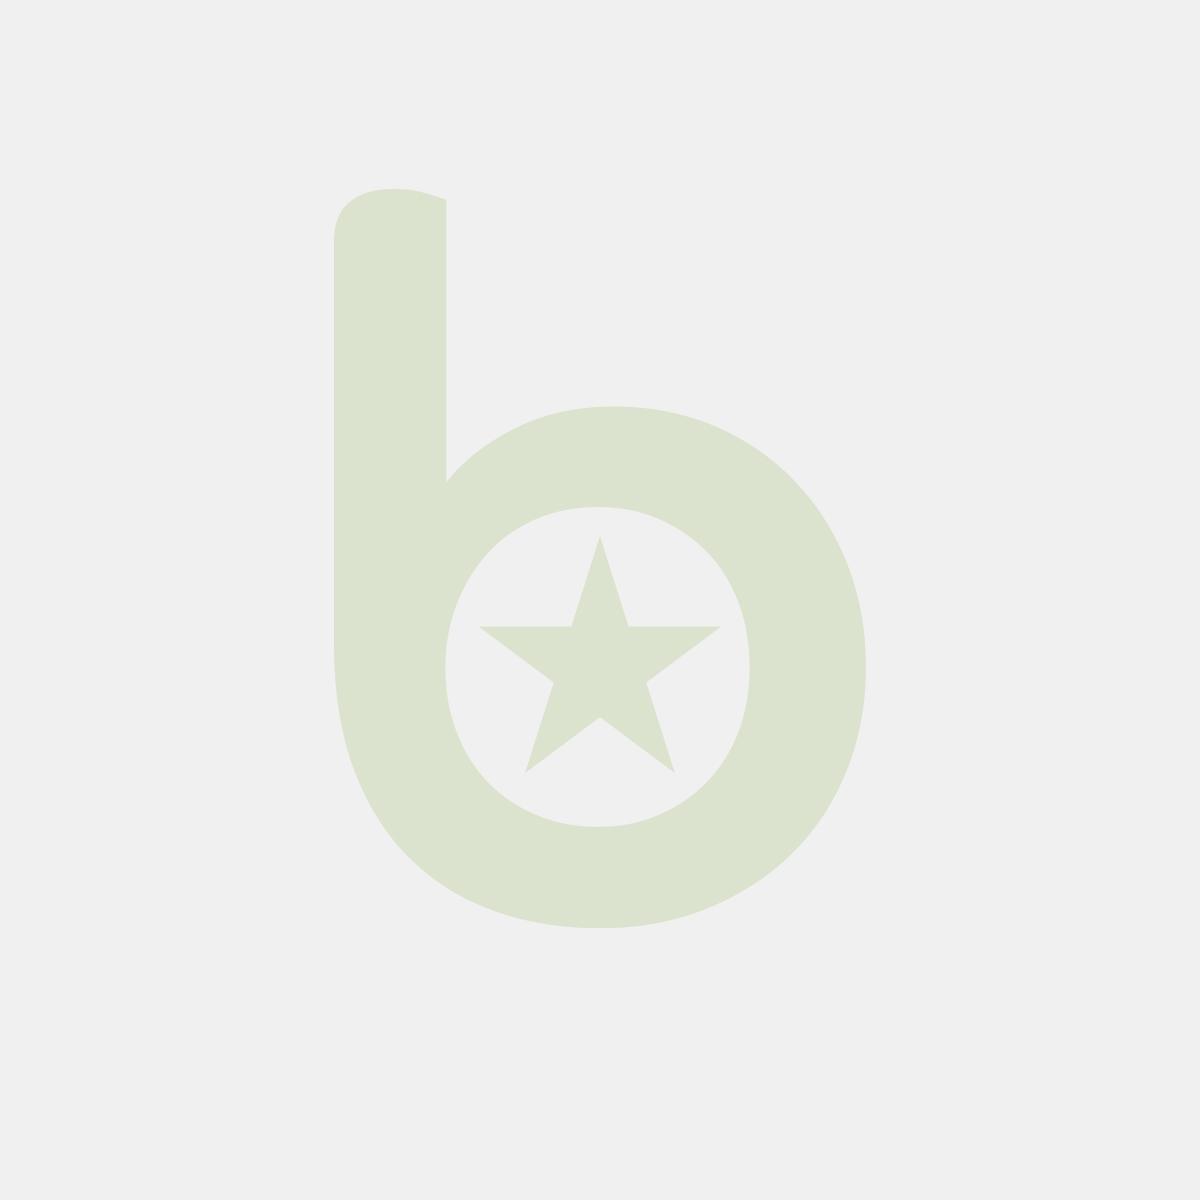 Pojemnik GN 1/6 Profi Line z polipropylenu